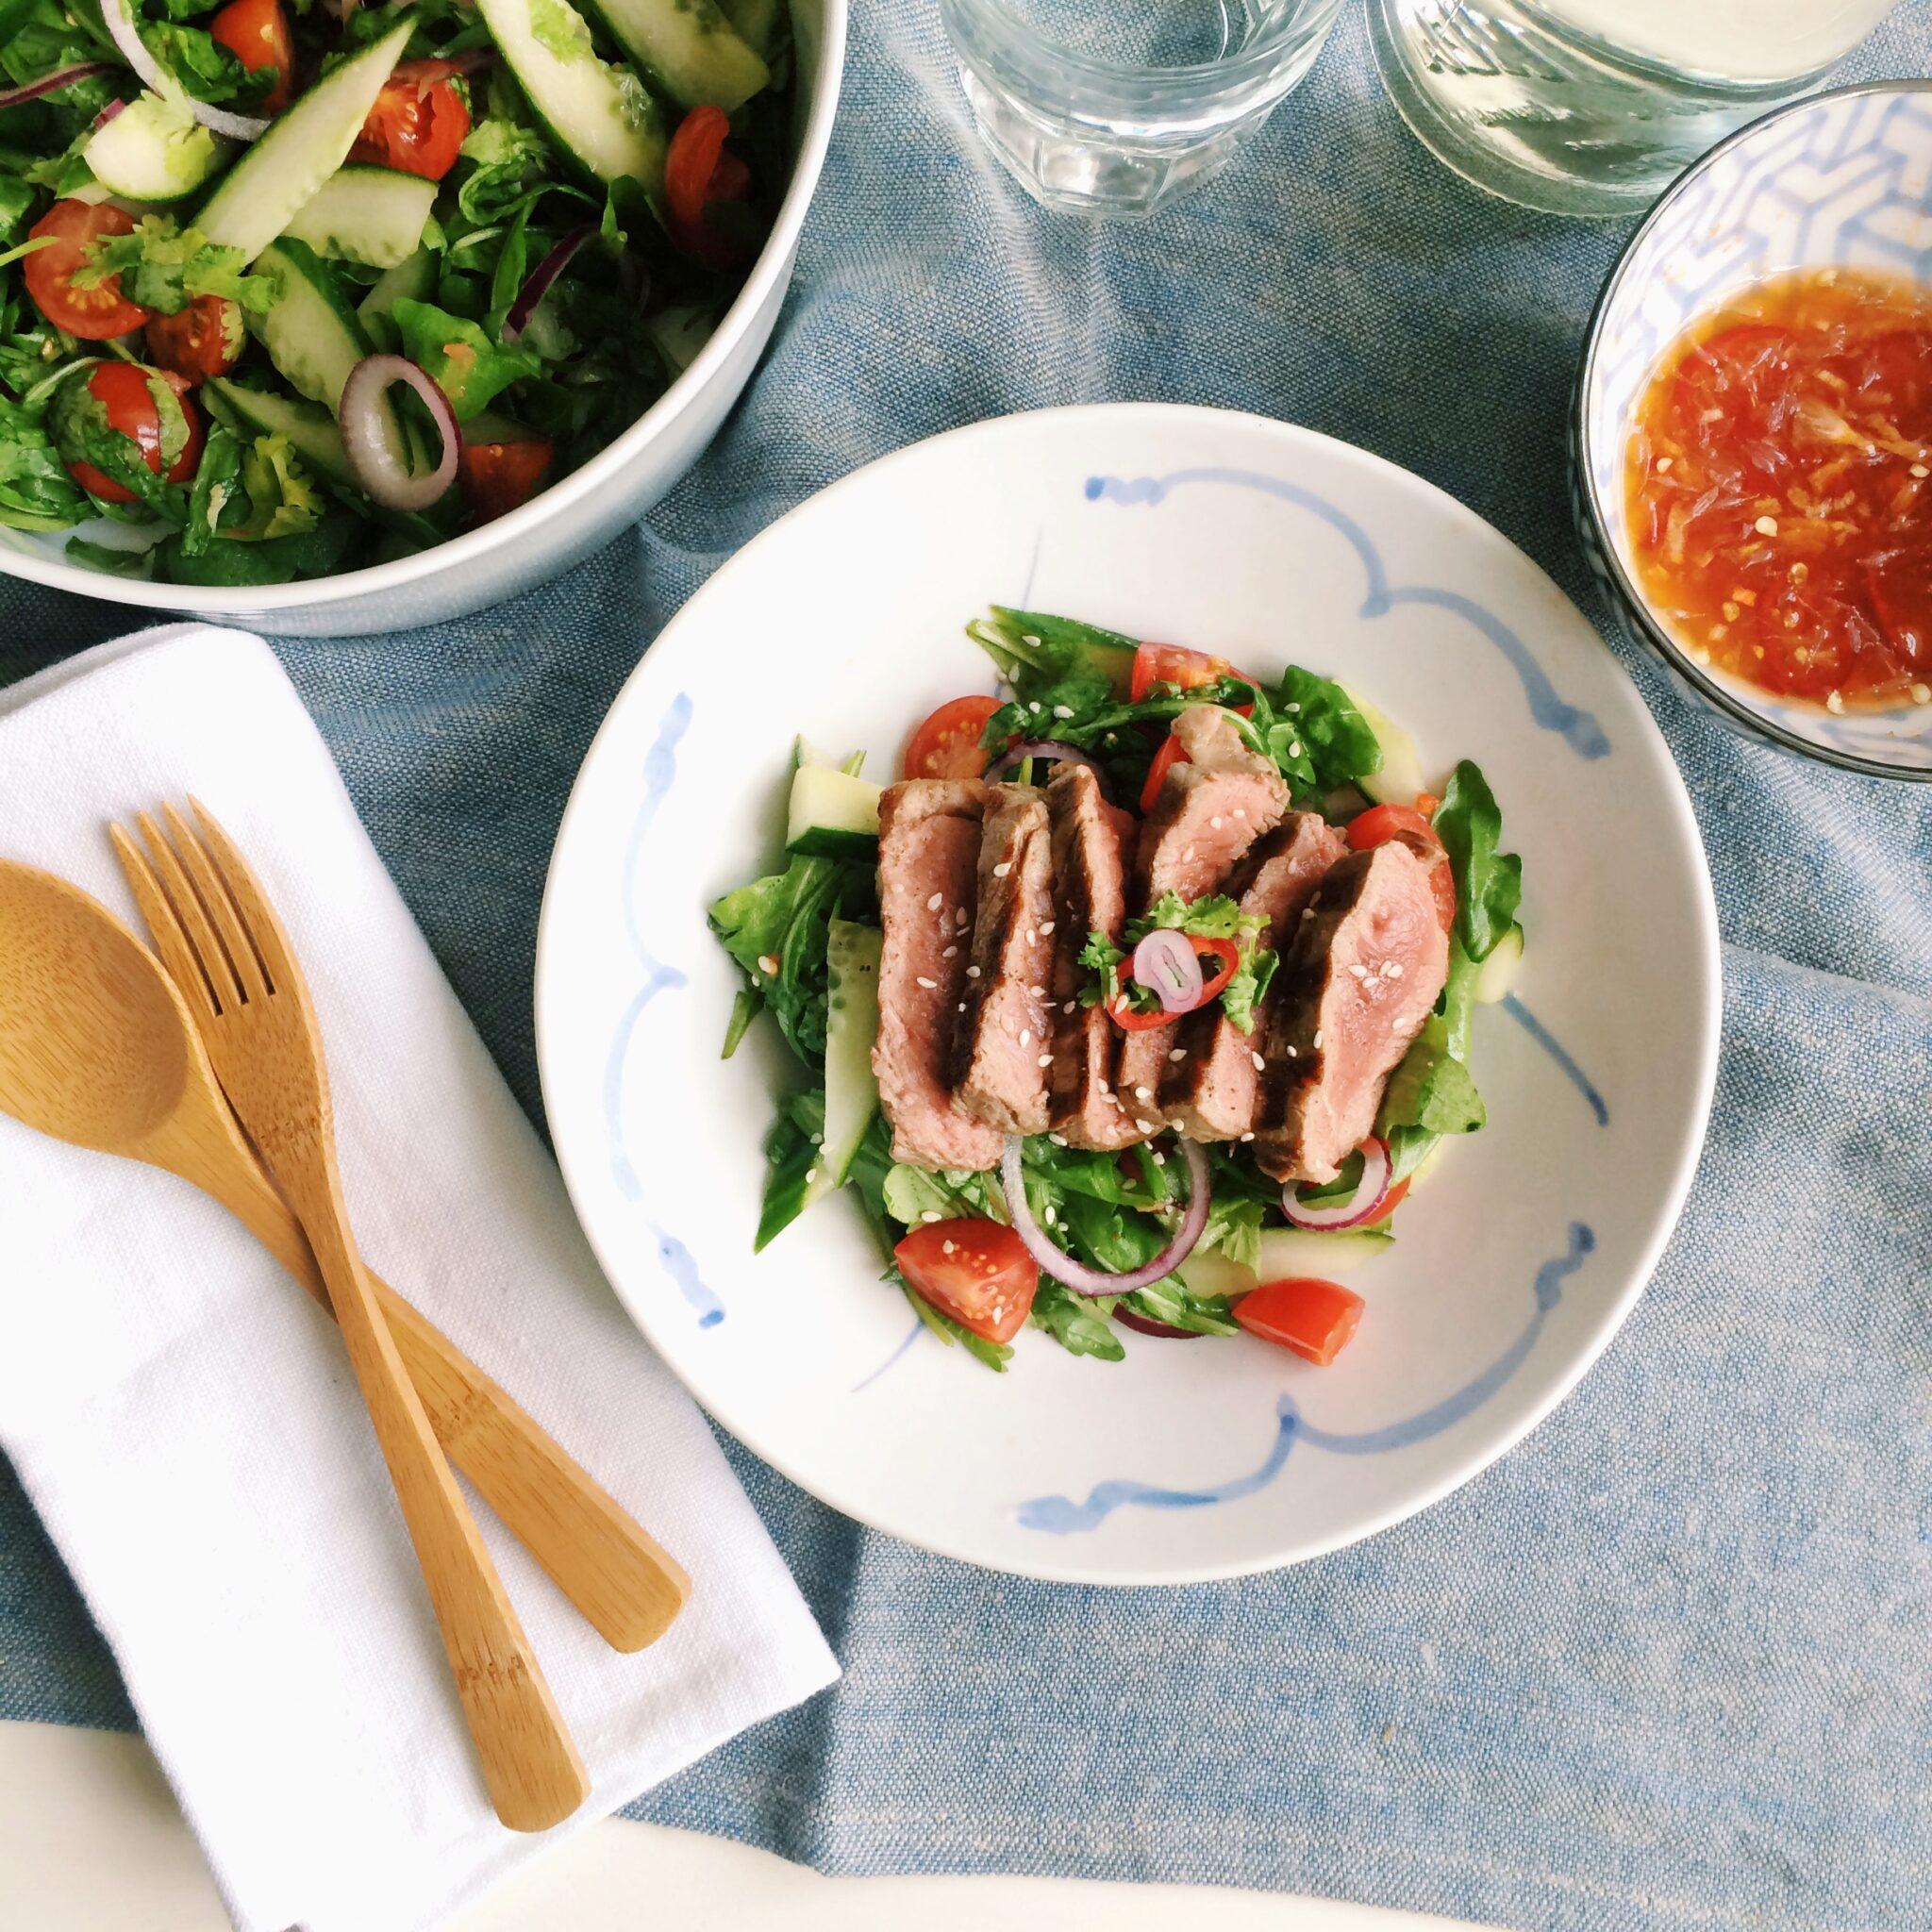 IMG 5847 - Recept Thaise biefstuksalade